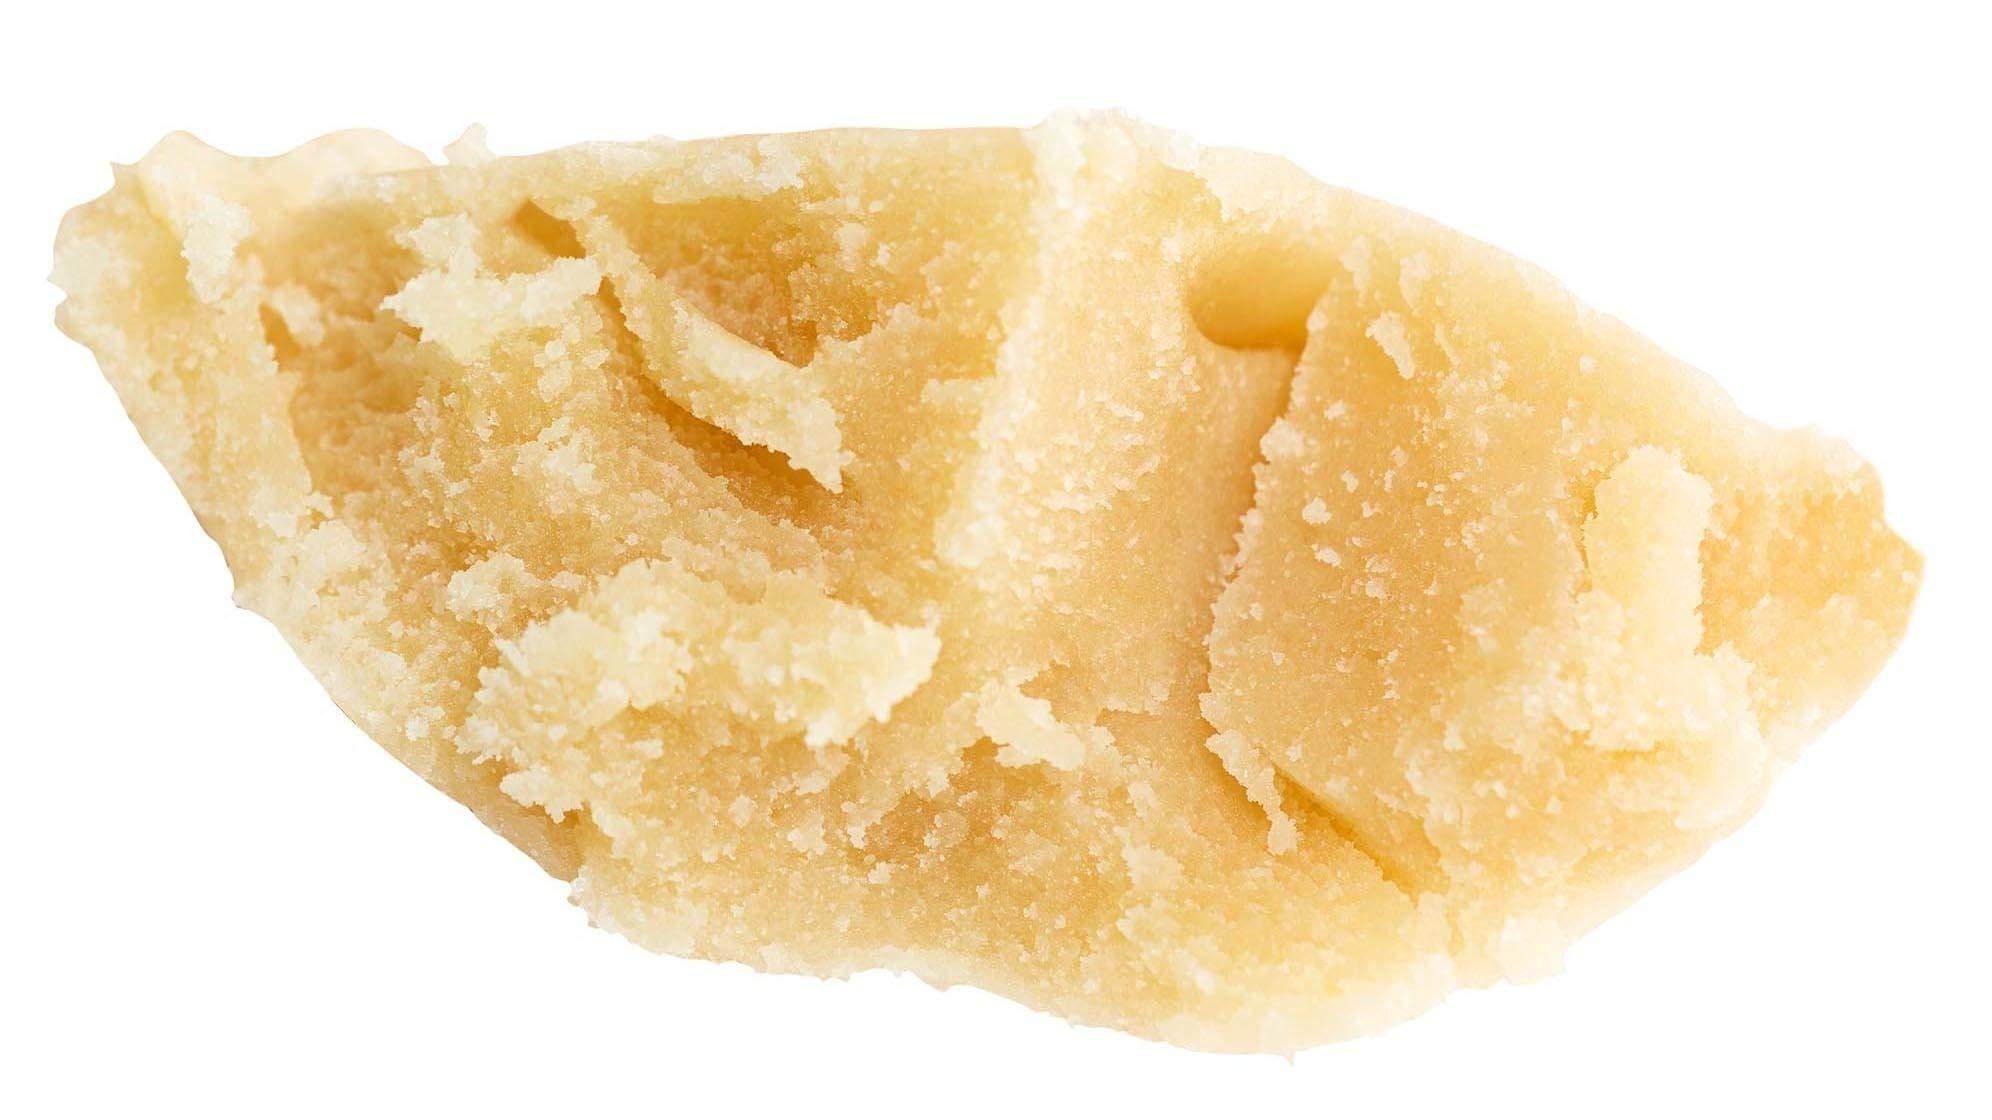 American Almond Almond Paste - 45 lb Tub by American Almond (Image #2)